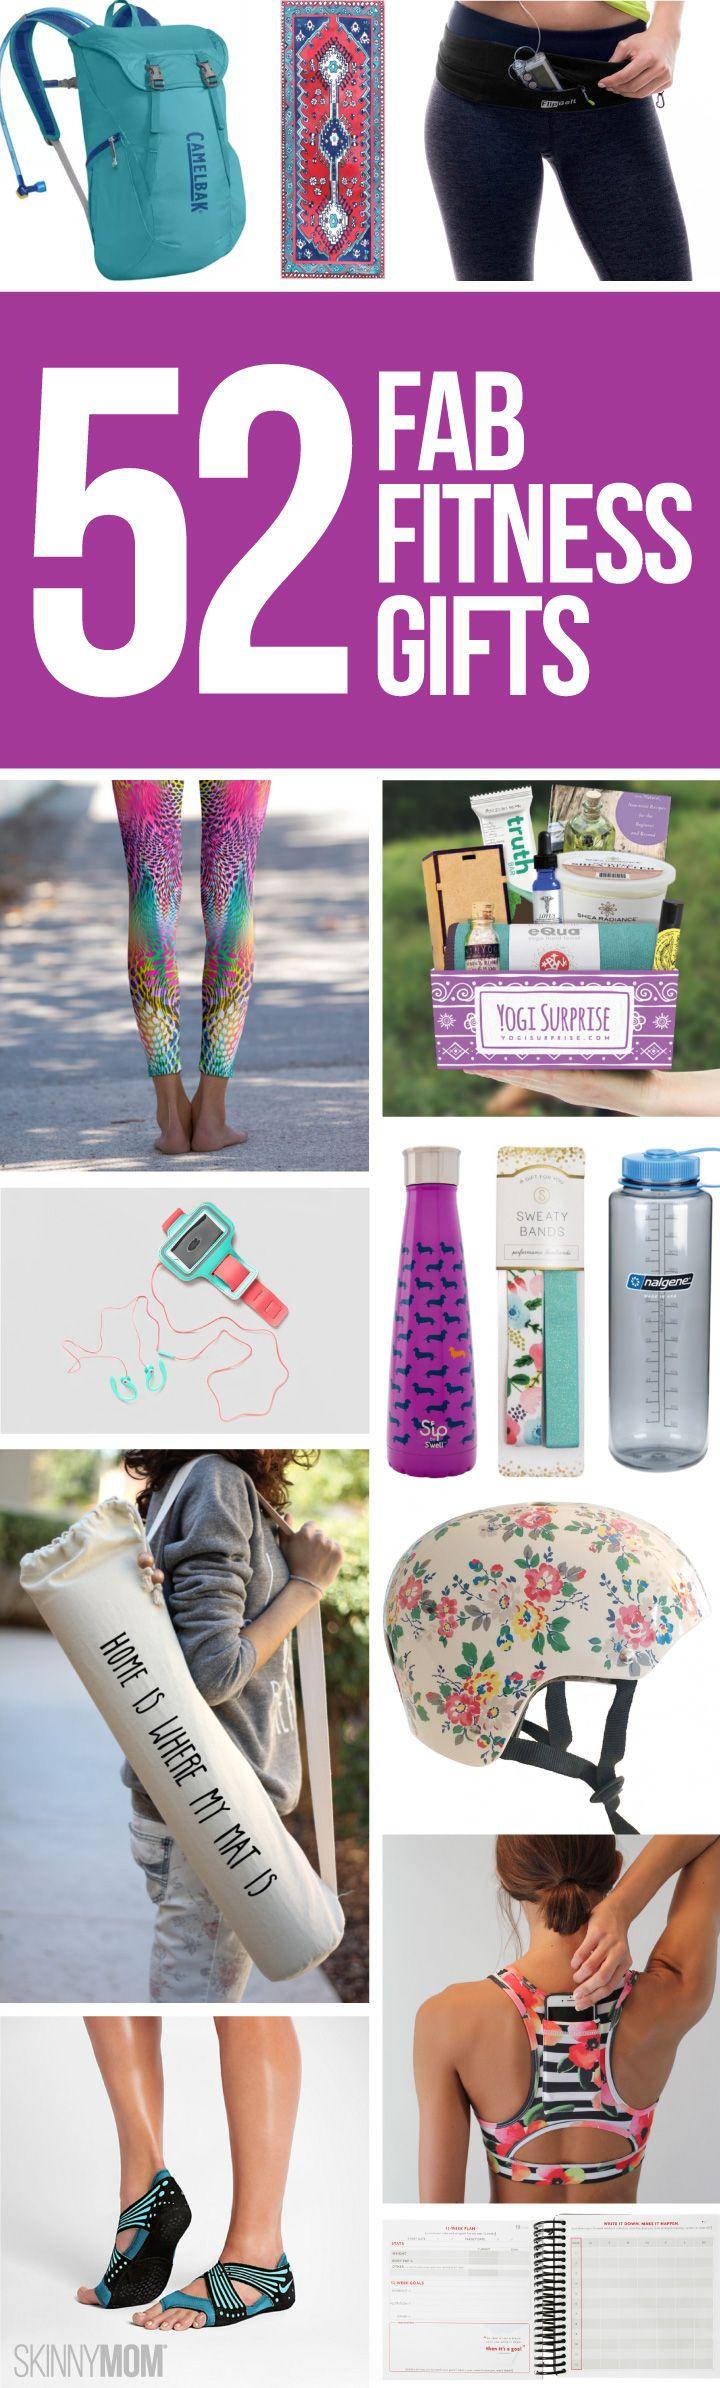 Need gift ideas for fitness lovers? We got 'em. https://www.linkedin.com/pulse/way-your-metabolism-job-properly-also-you-get-time-enjoy-edwards/?published=t